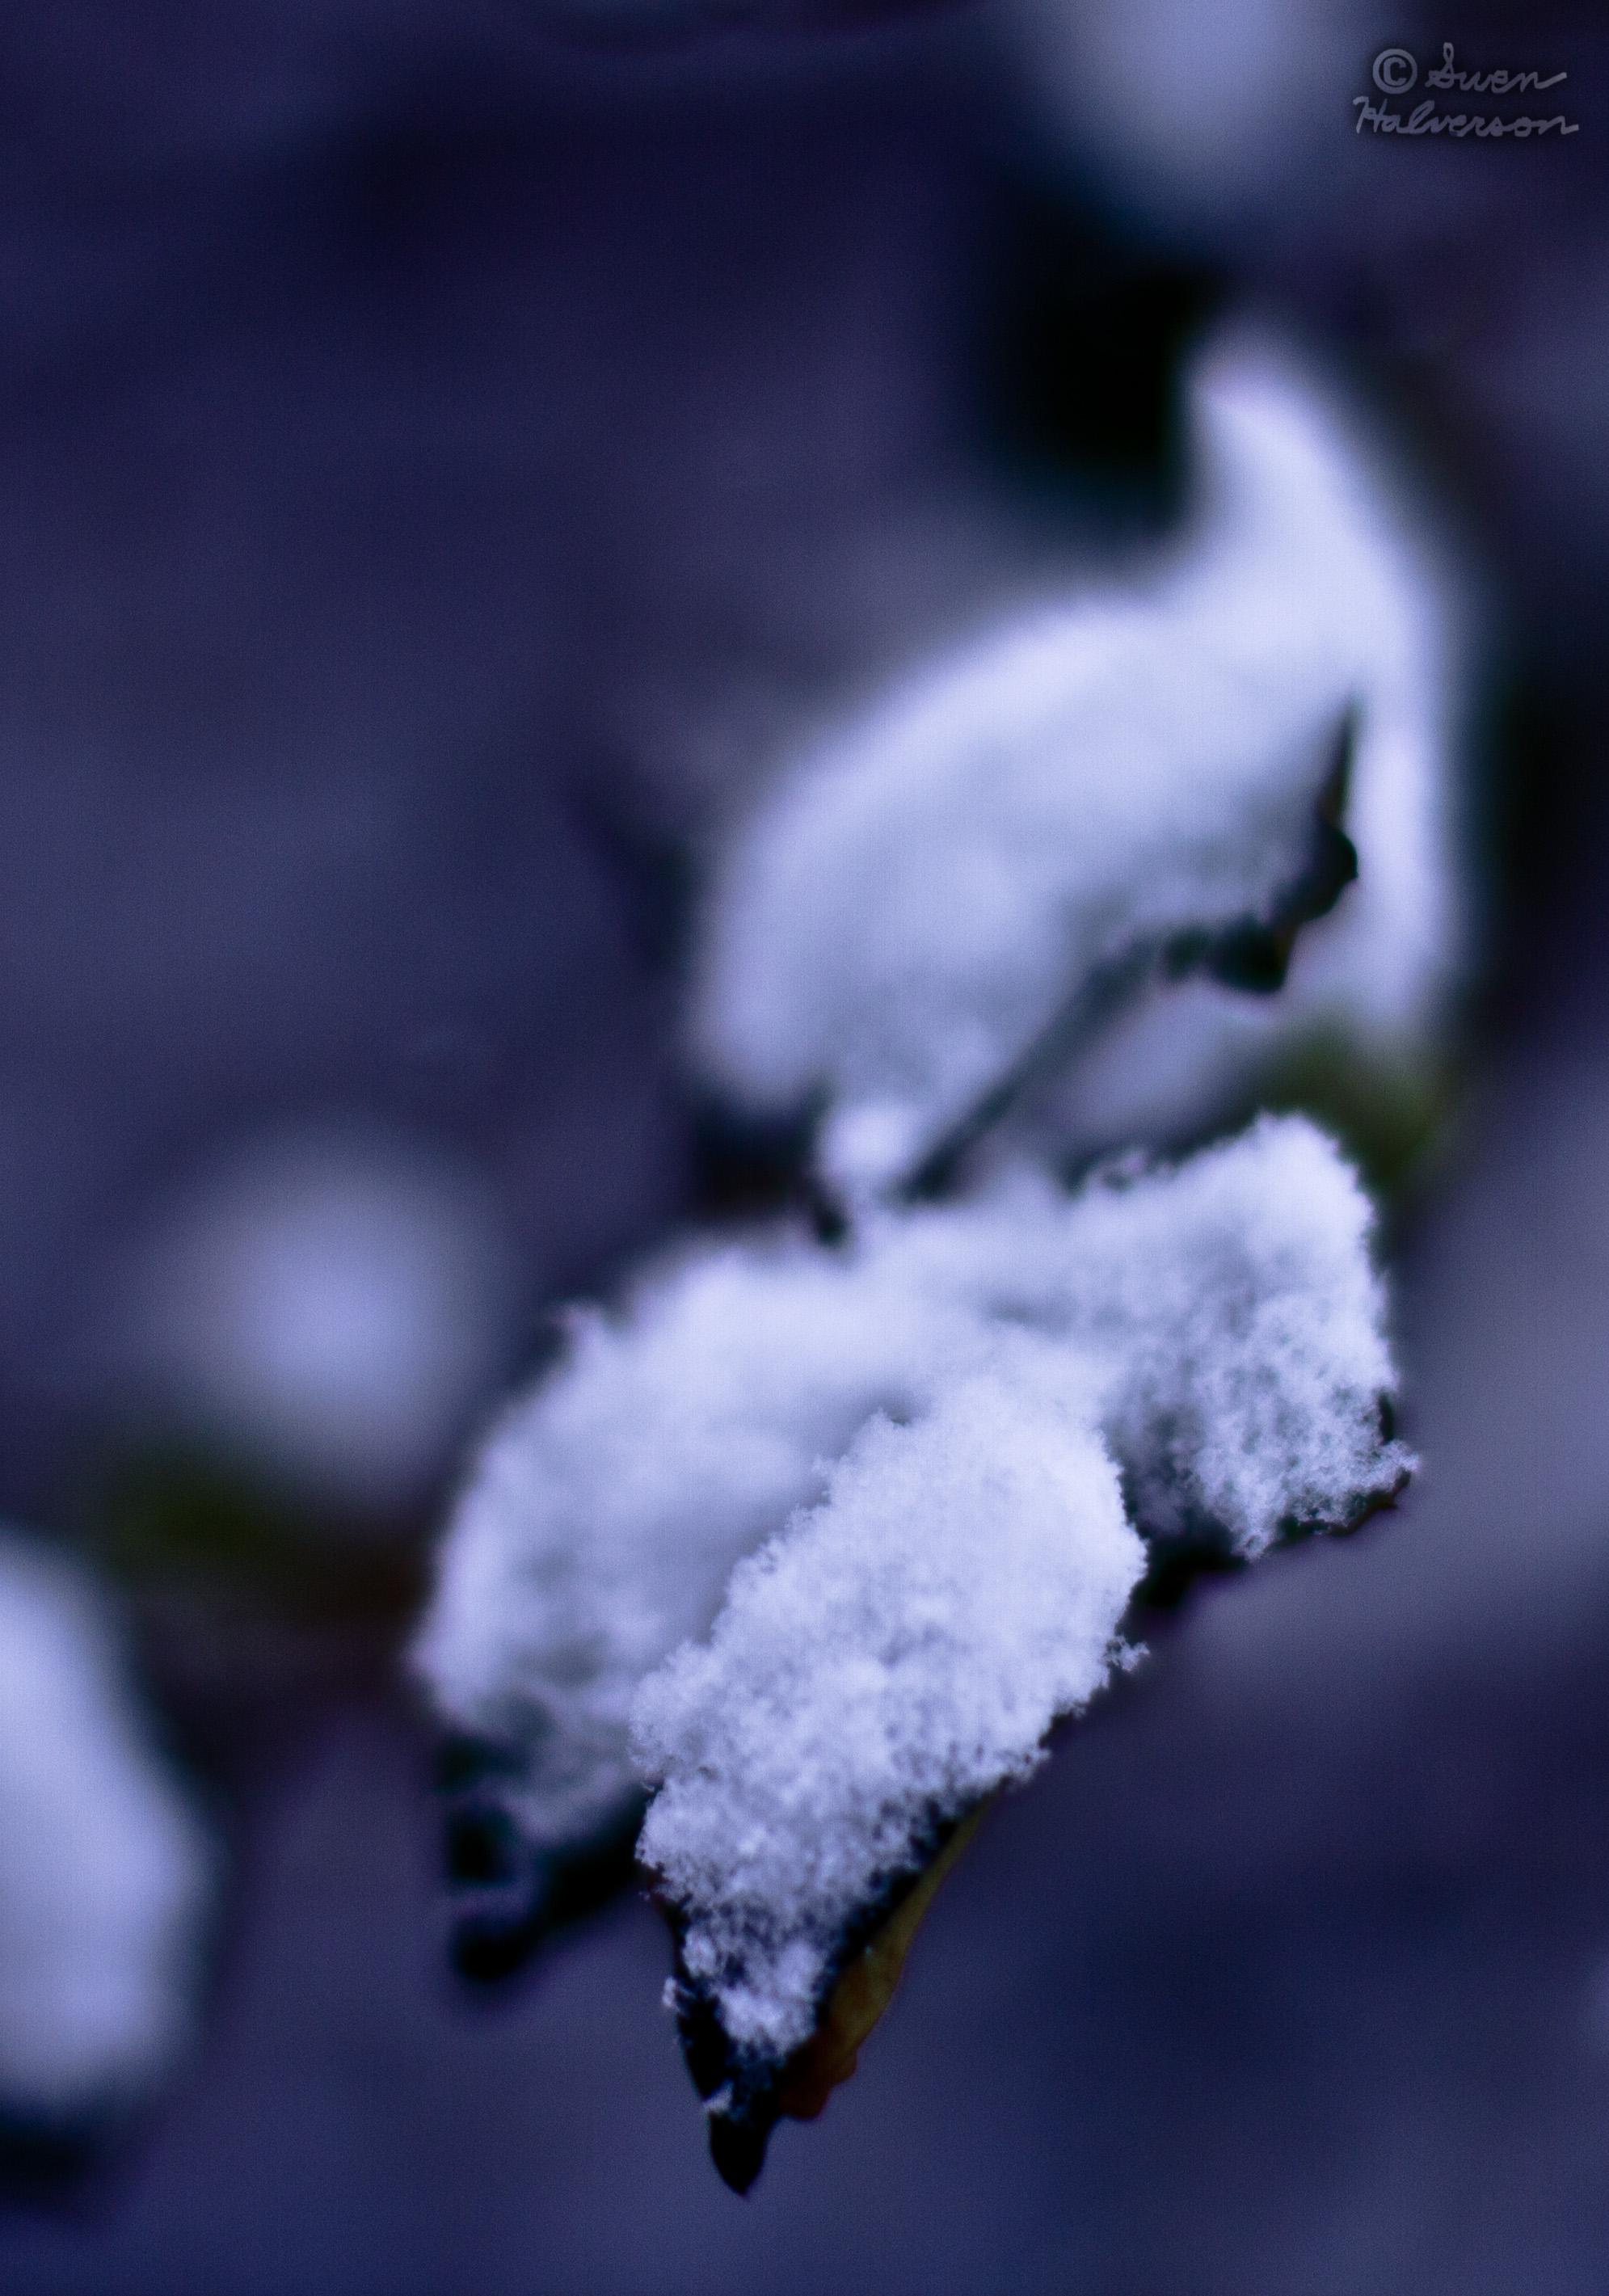 Theme: Cold  <br>Title: Snow Leaf